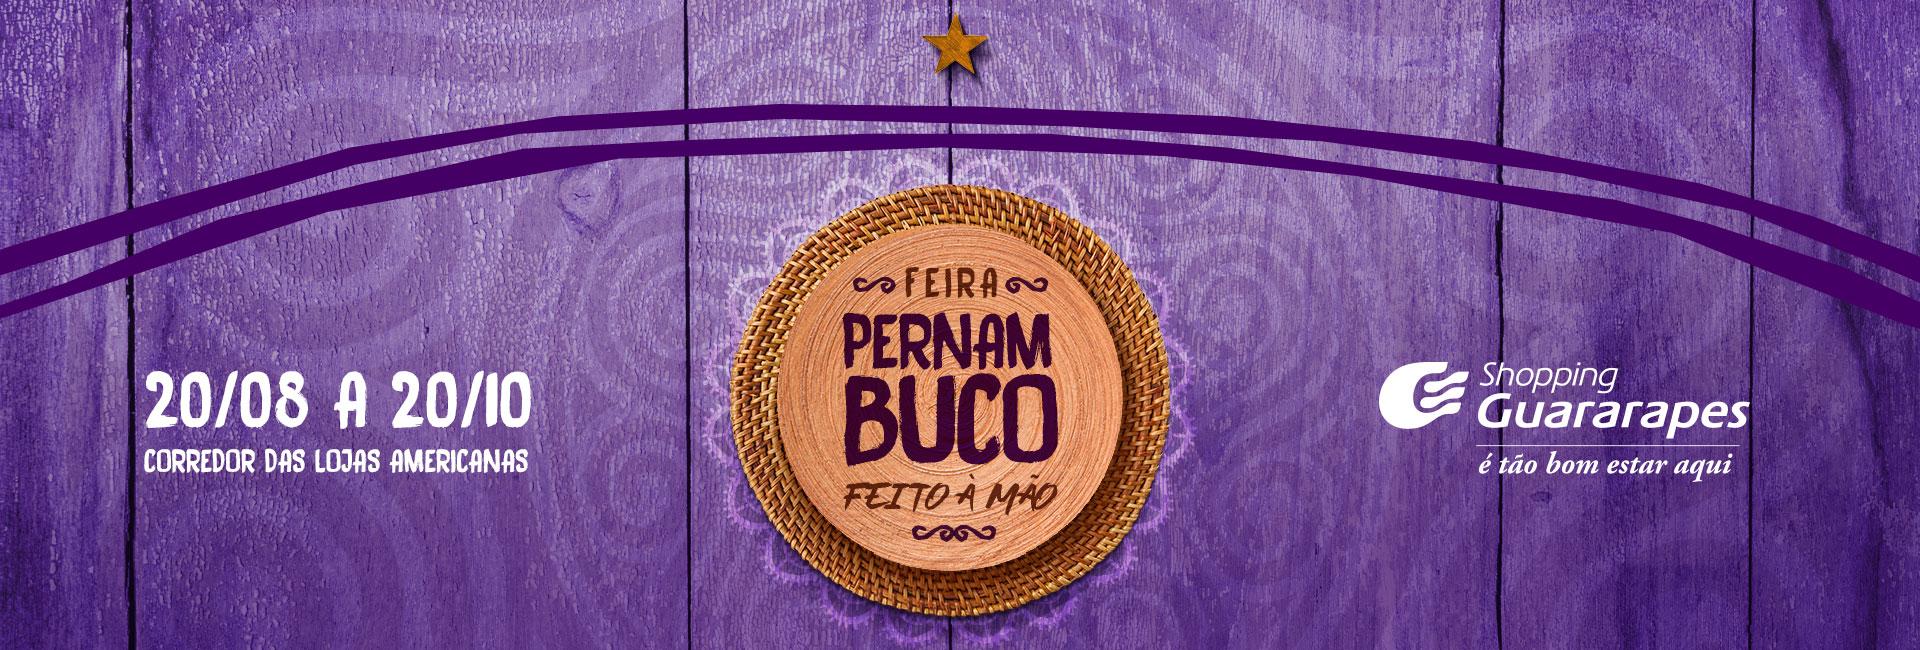 Feira Pernambuco